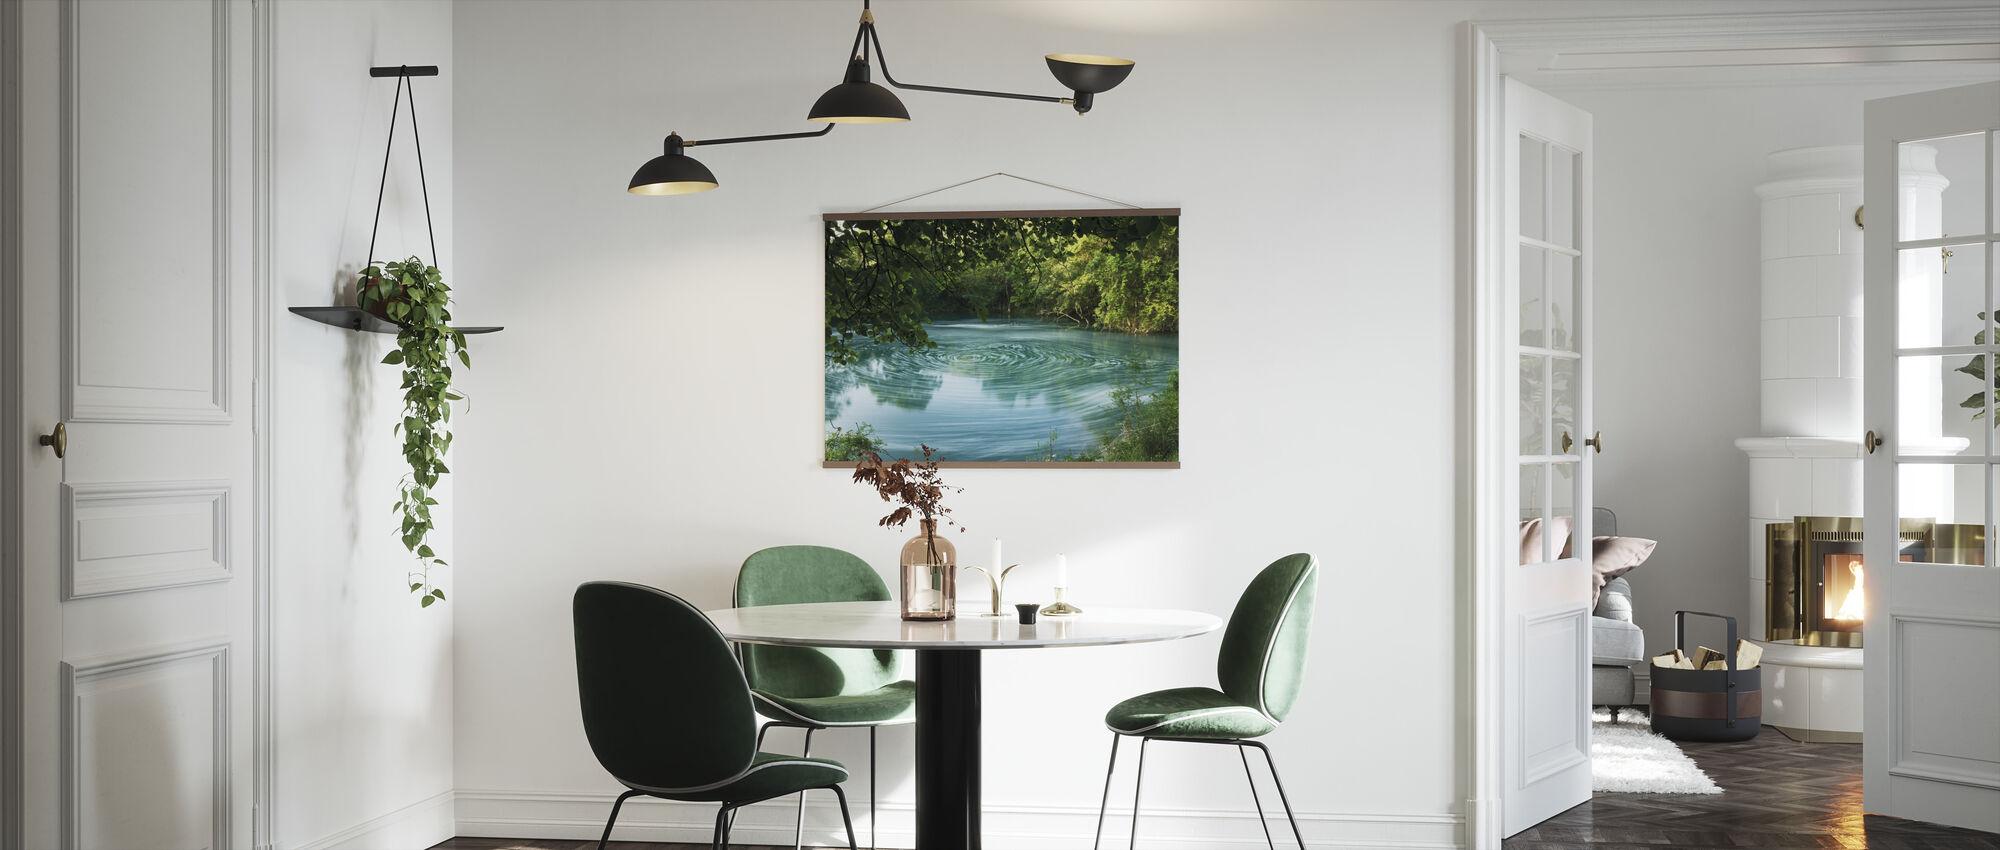 Whirlpool - Poster - Kitchen